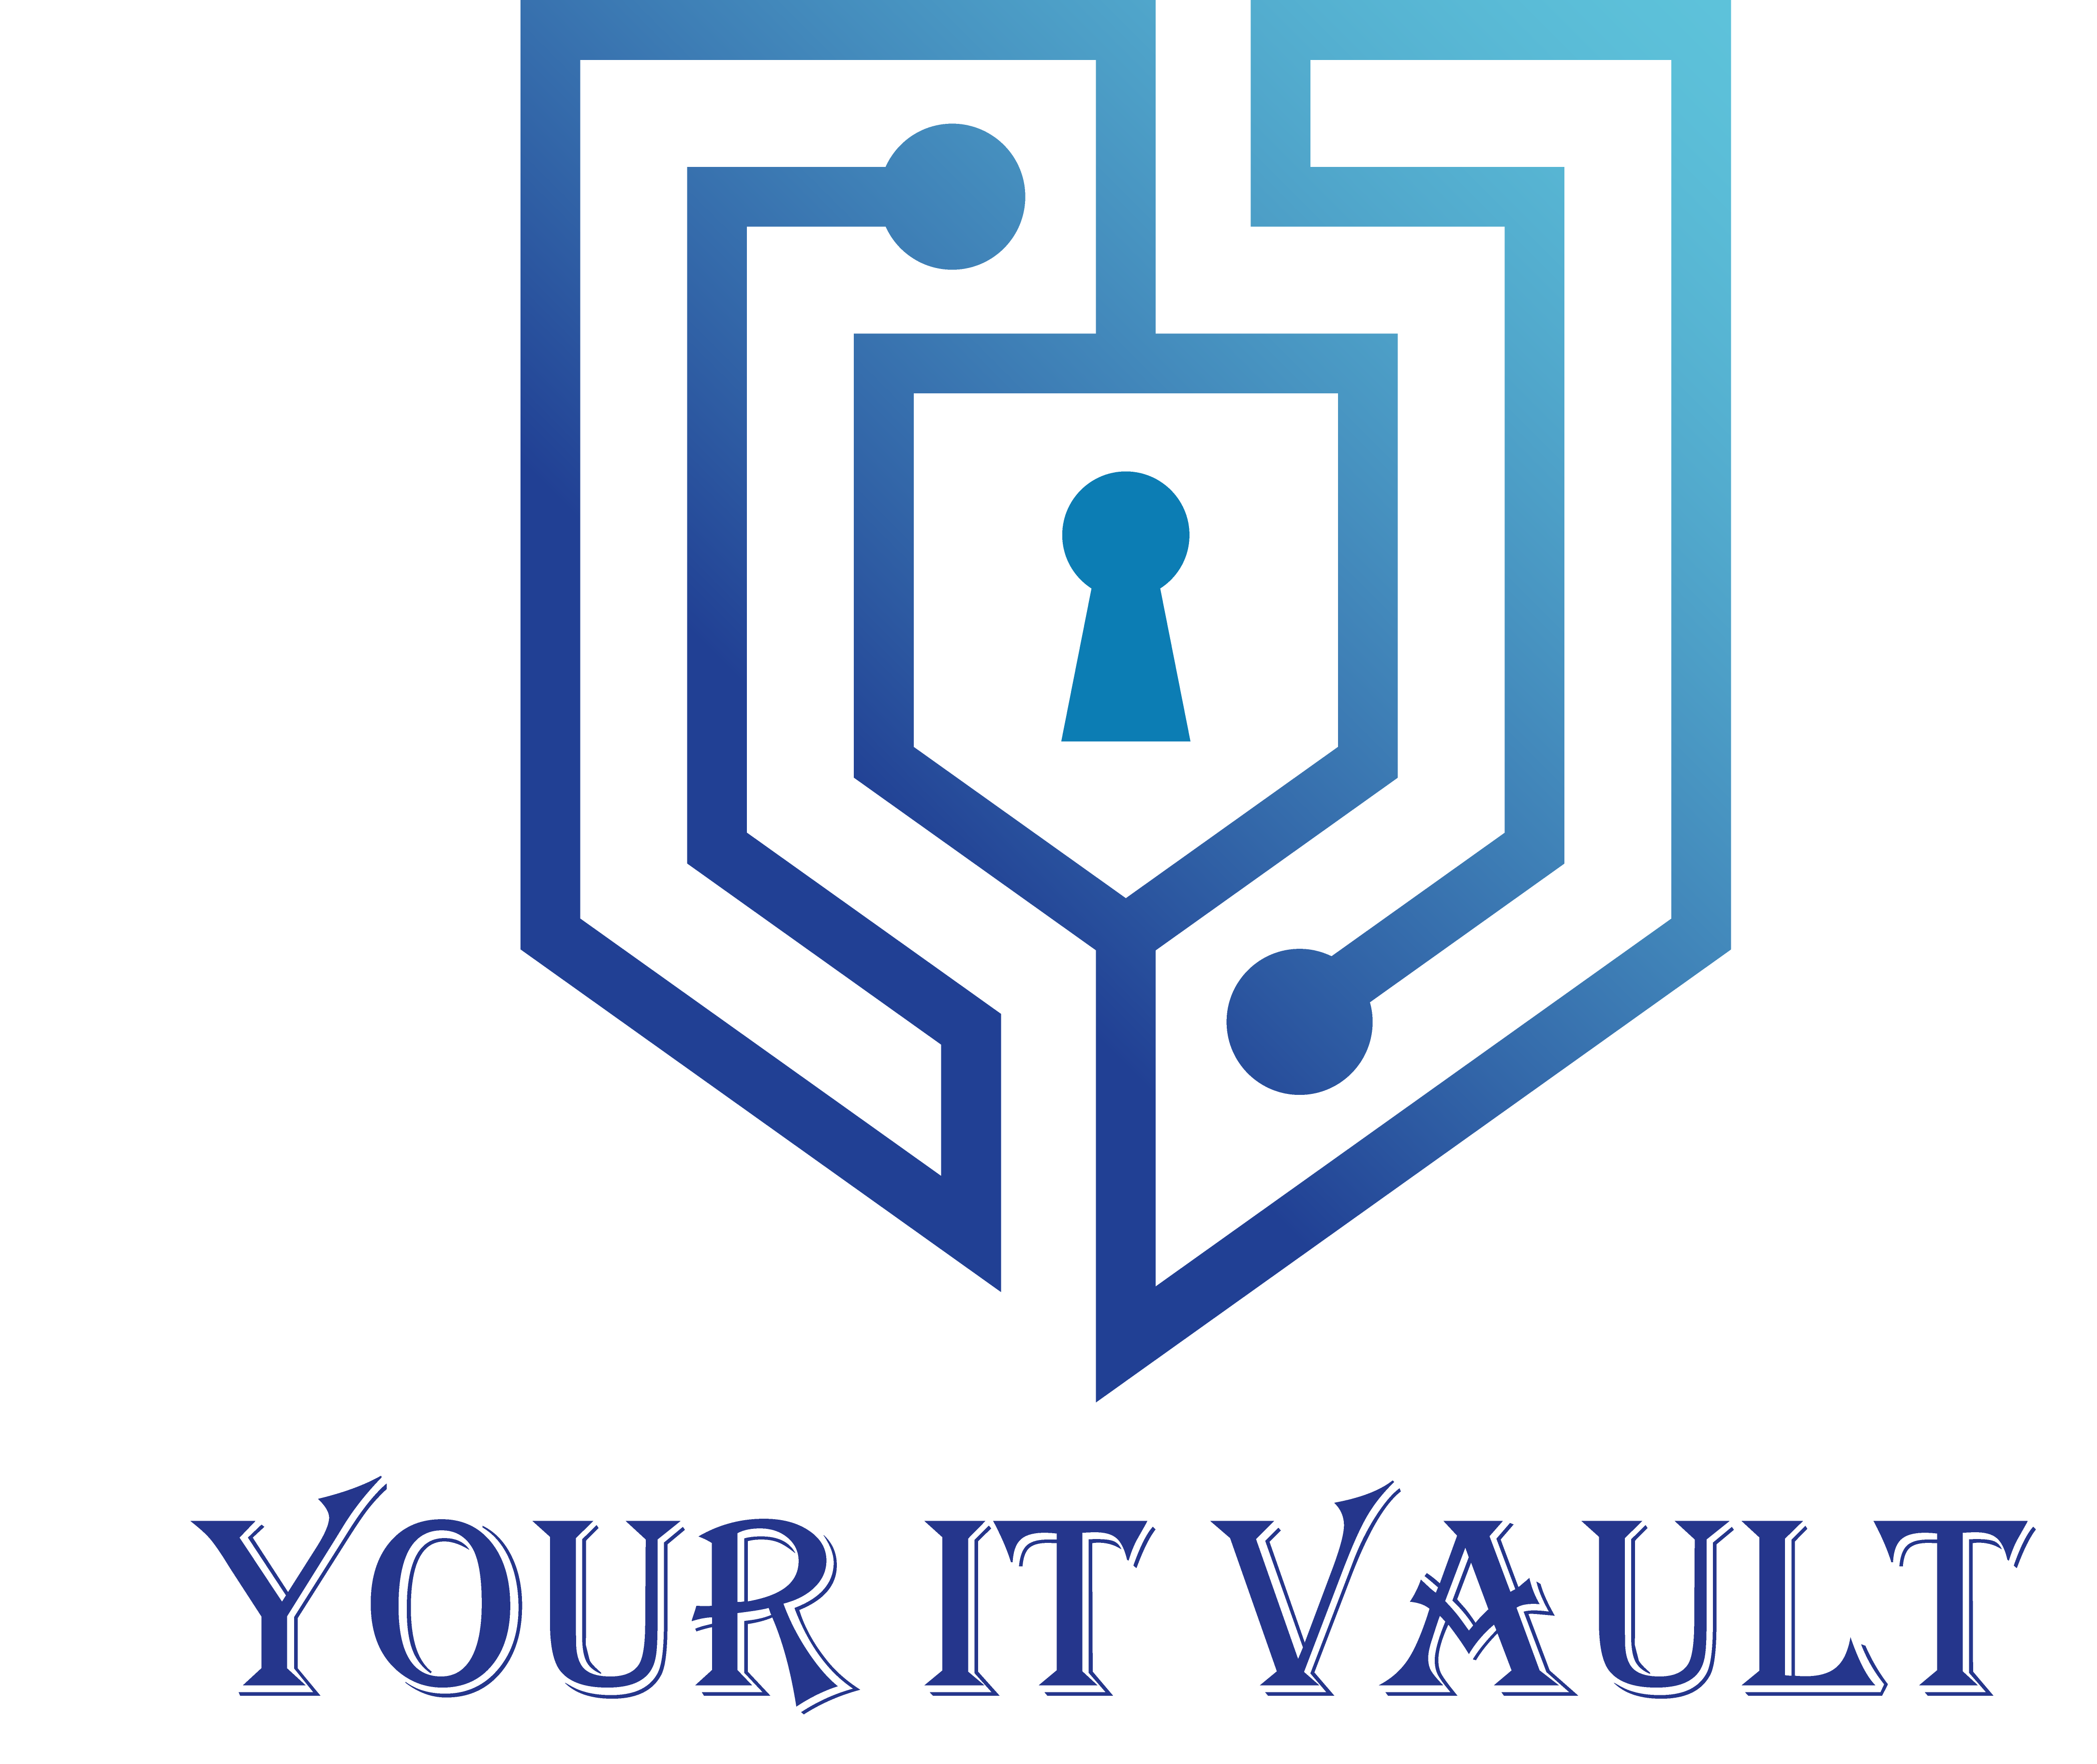 your it vault